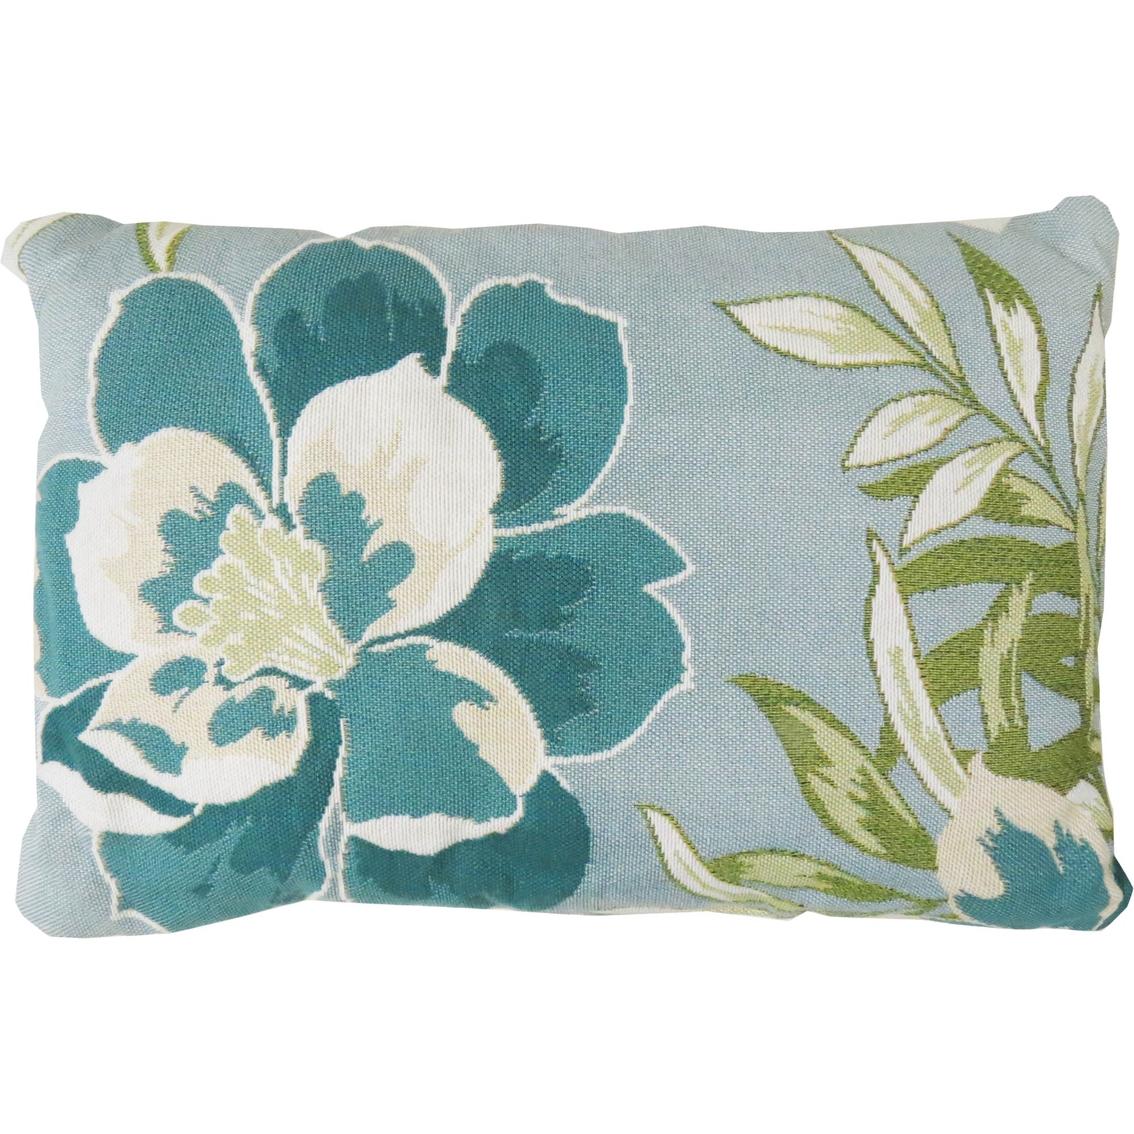 Vintage House By Park B. Smith Coastal Blossom Tapestry Decorative Pillow Decorative Pillows ...